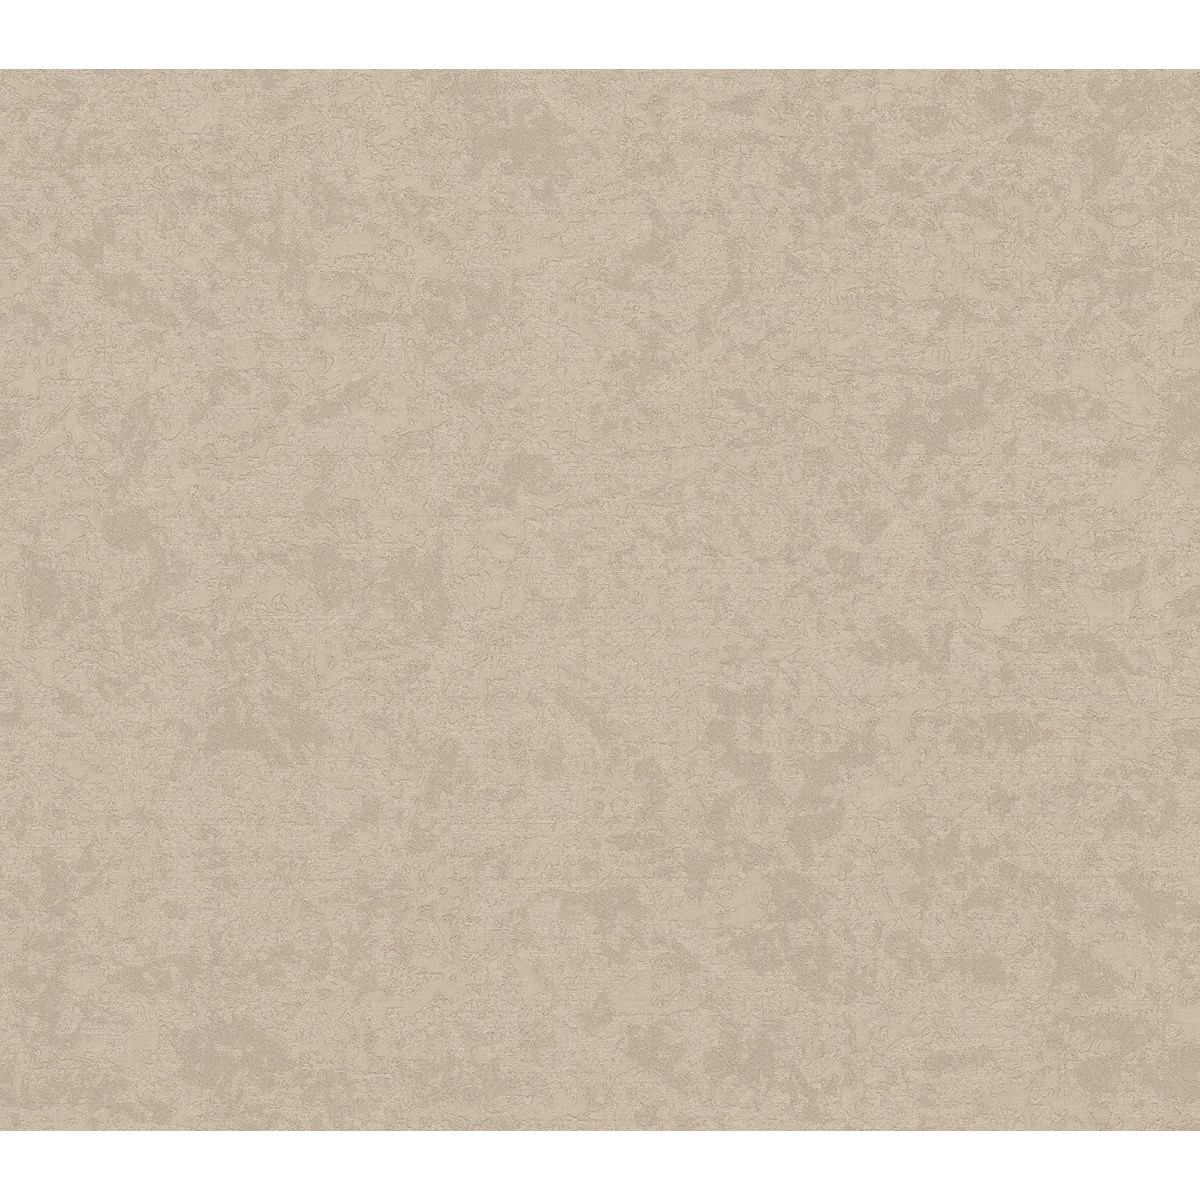 Обои флизелиновые Мир Авангард бежевые 1.06 м 45-169-06